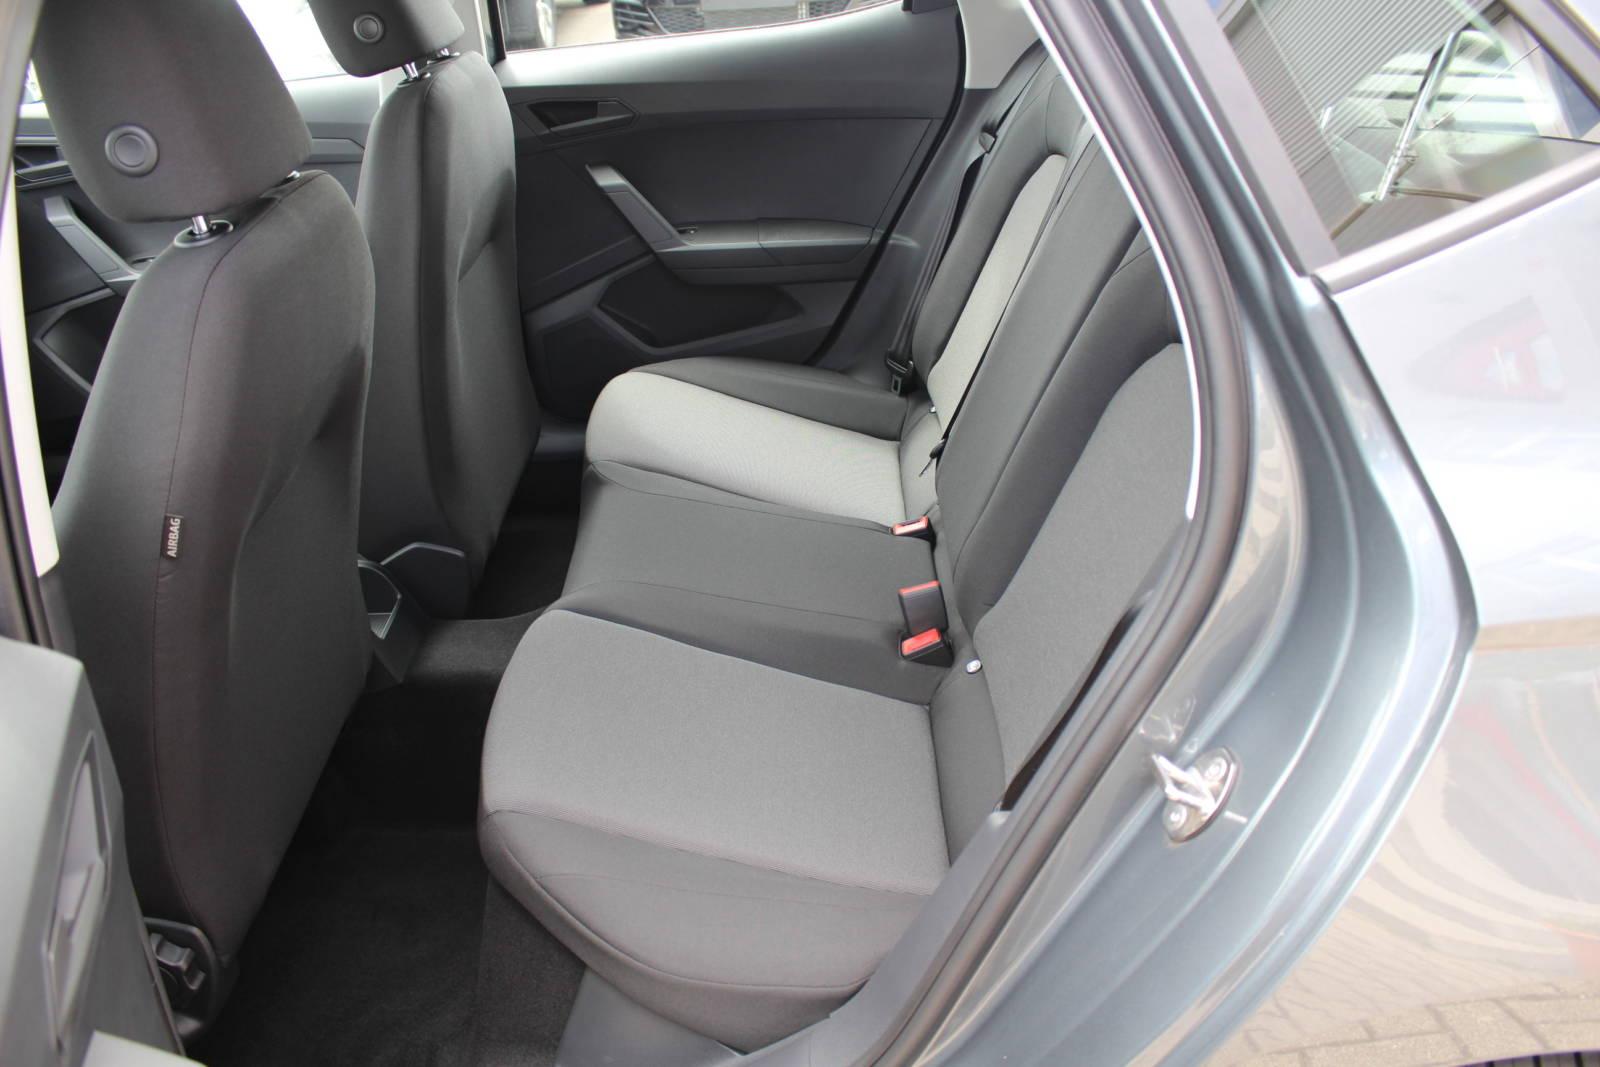 Seat Ibiza Reference 1.0 TSI / Deutsche Neufahrzeuge und EU-Neufahrzeuge – Aha! Fahrzeughandel GmbH in Althengstett